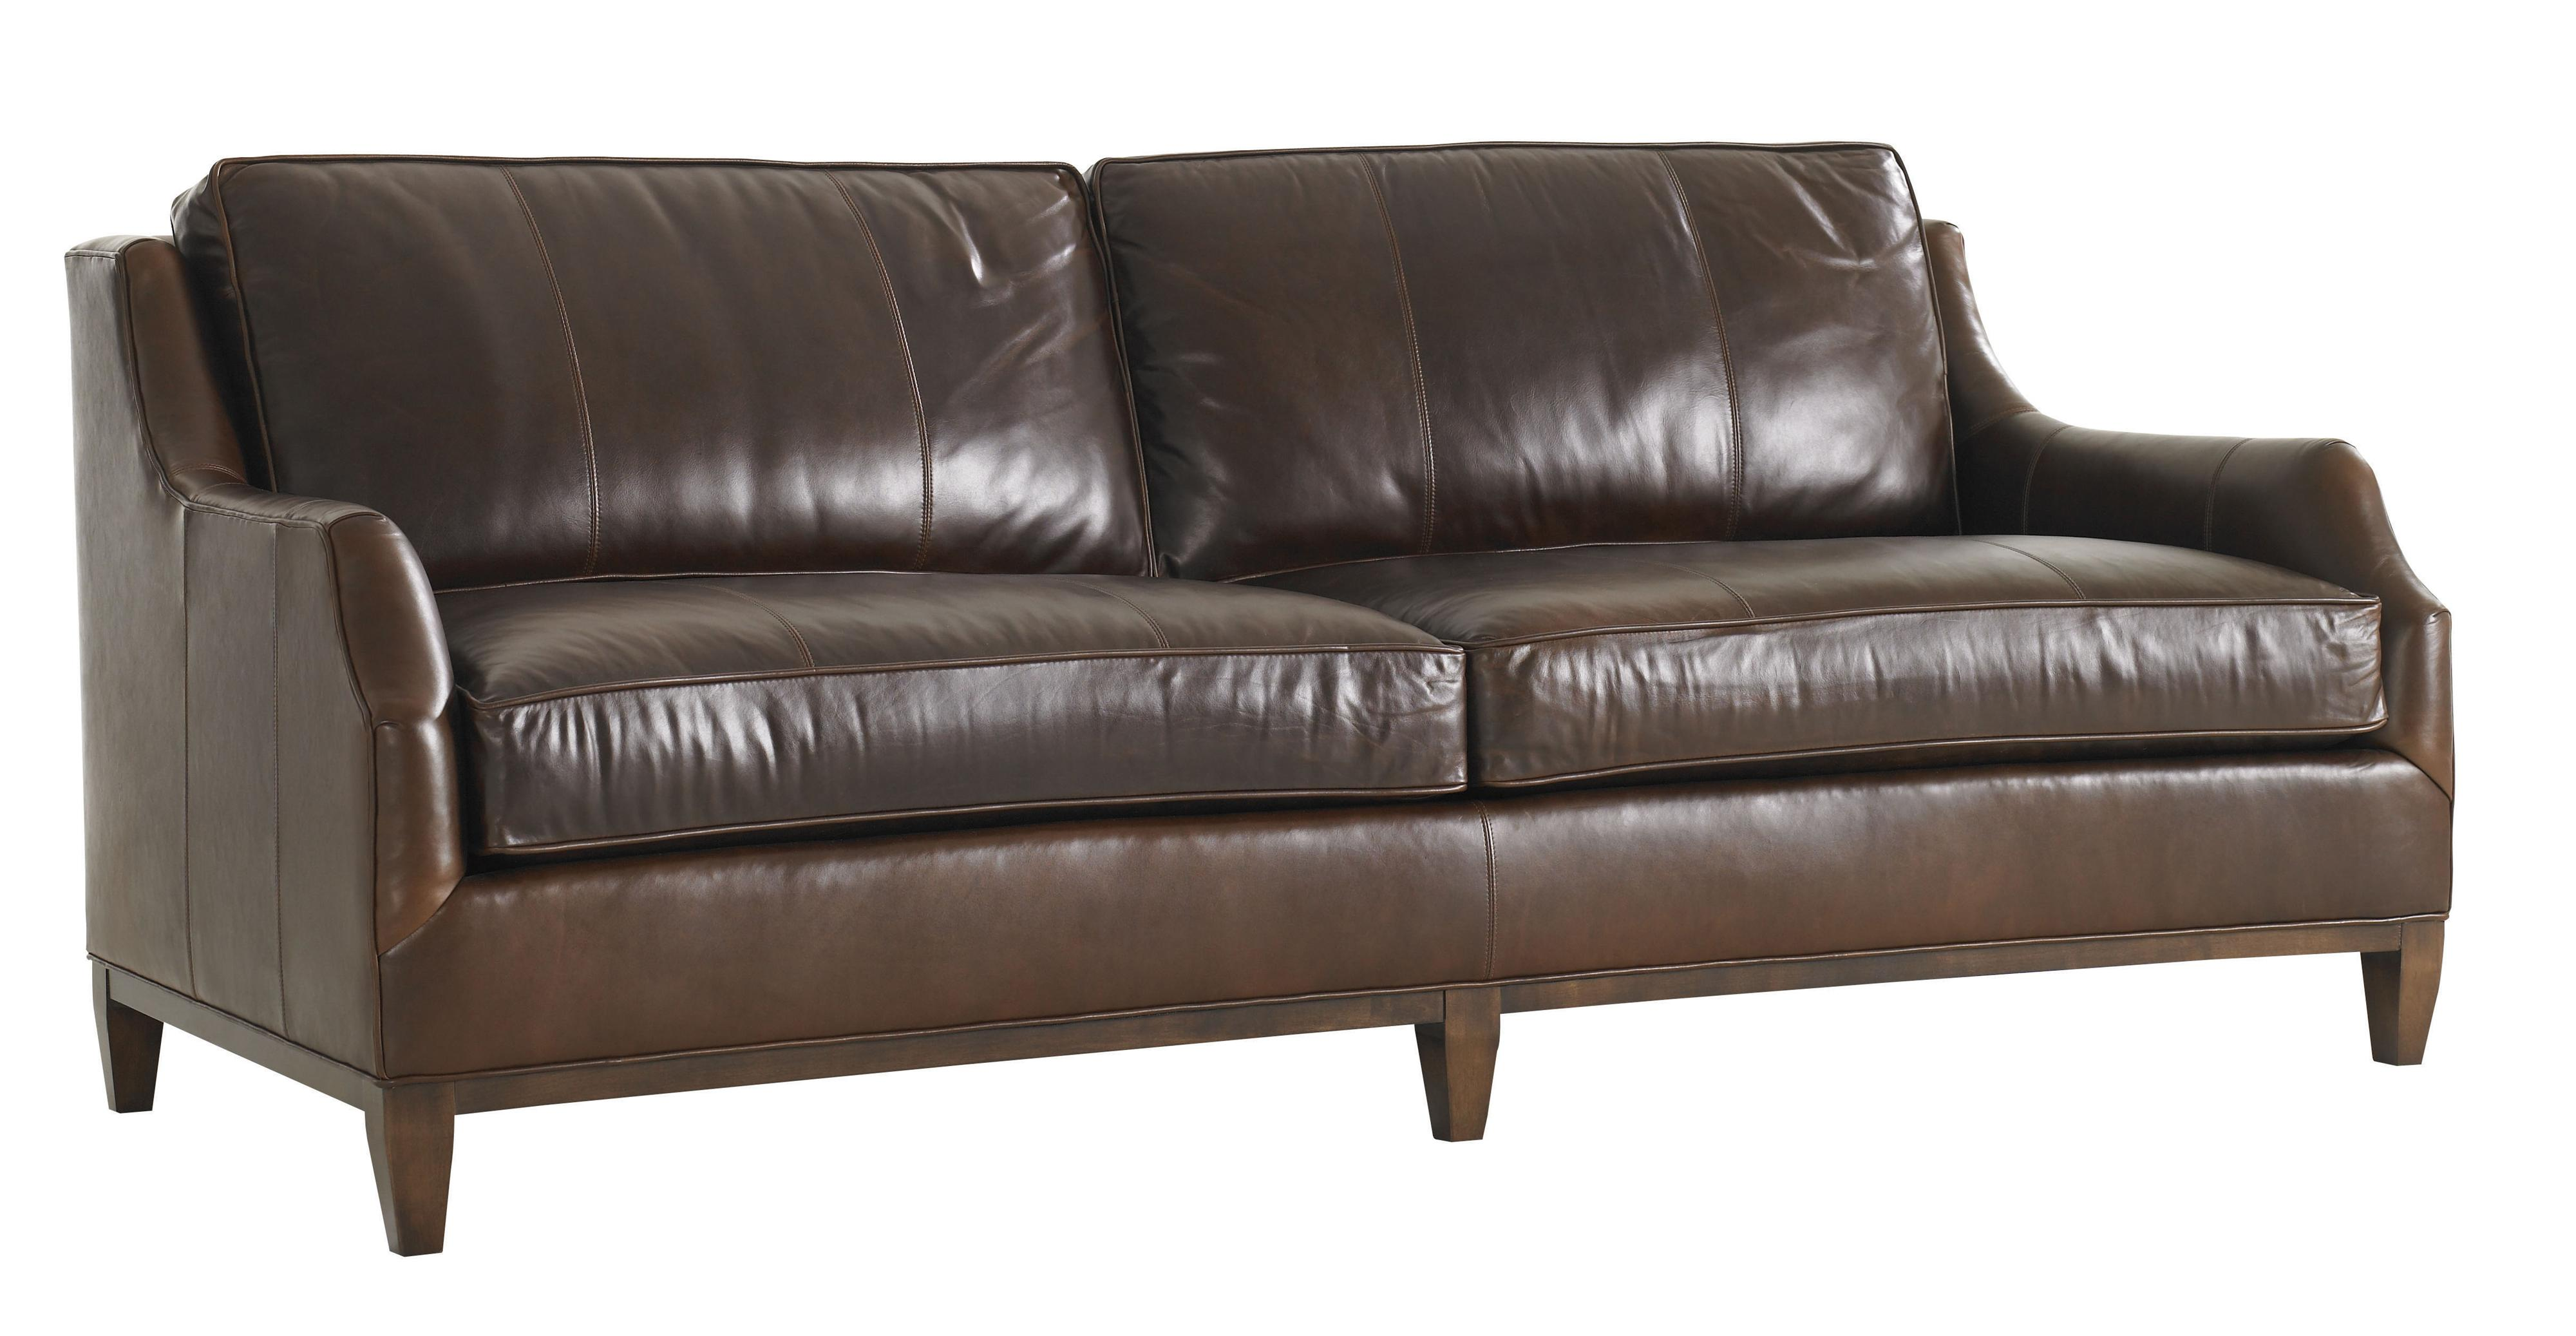 conversational sofa cover cordovan leather lexington tower place ll7991 33 contemporary conrad